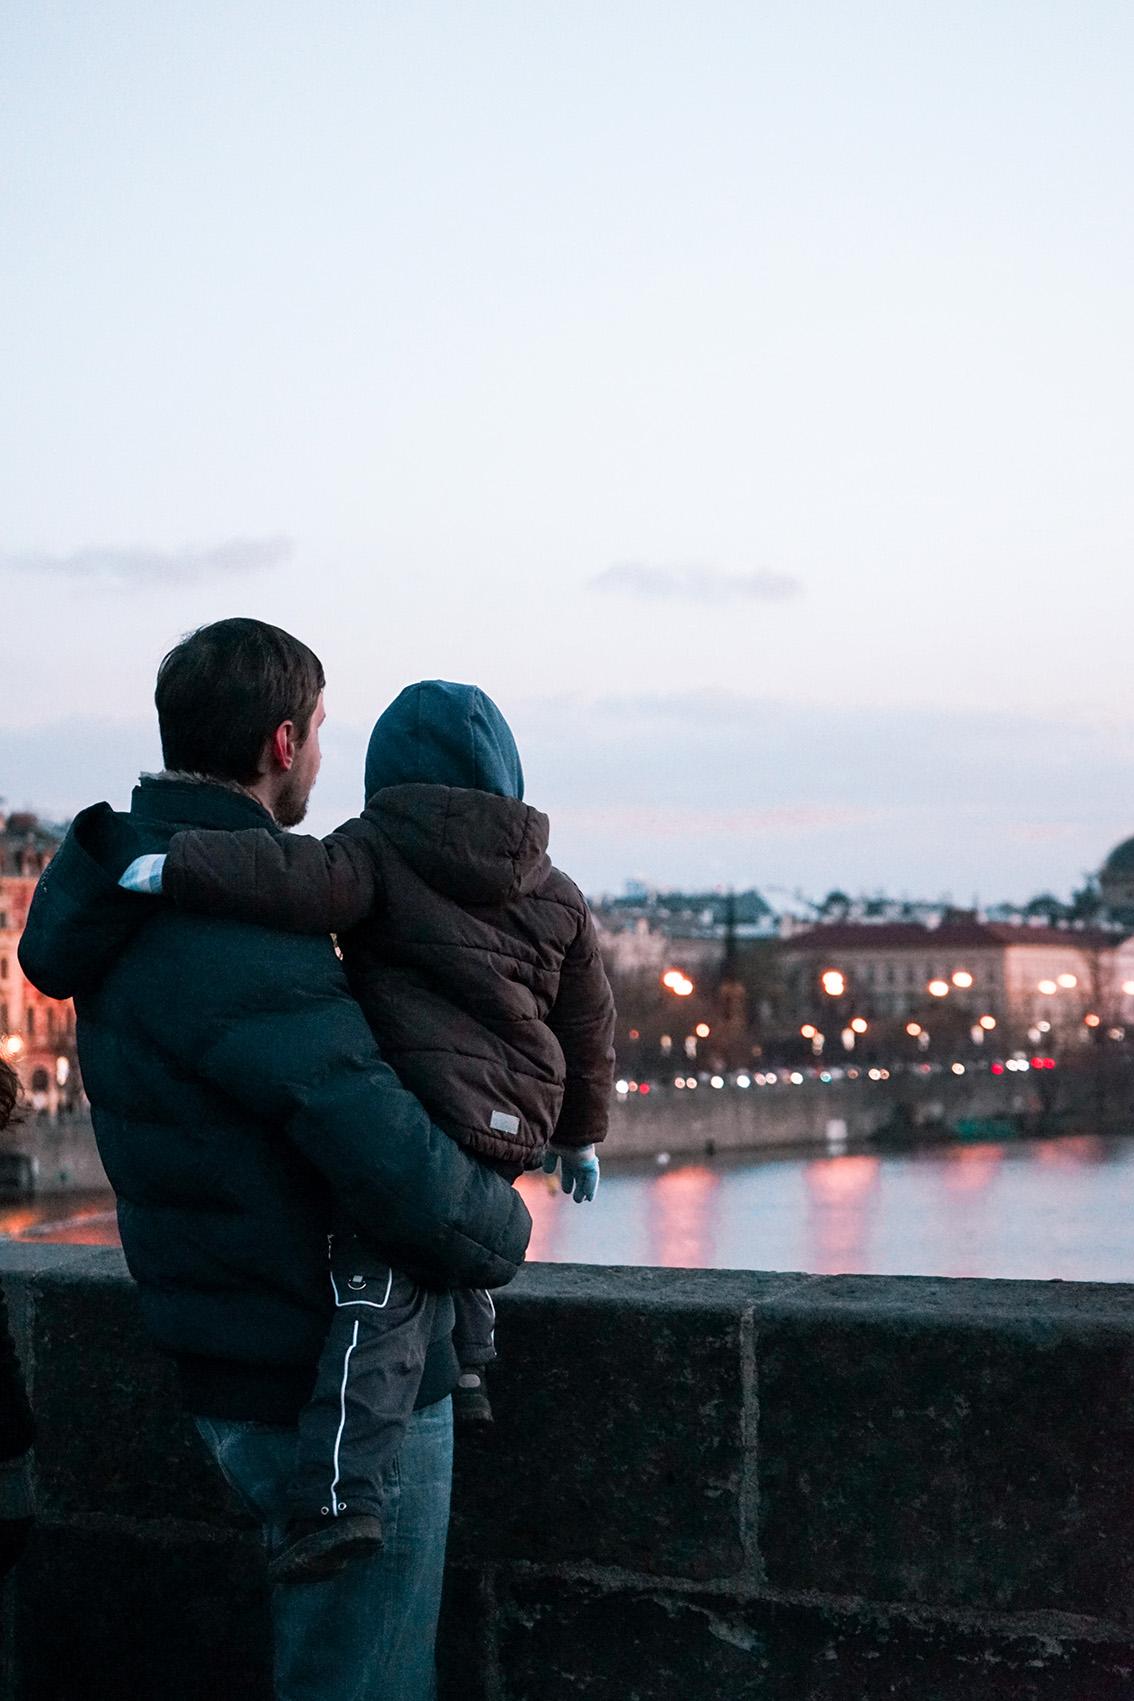 8-2 Weekend a Praga: 7 cose da vedere, dove dormire, gli indirizzi food e i Mercatini di Natale più belli.